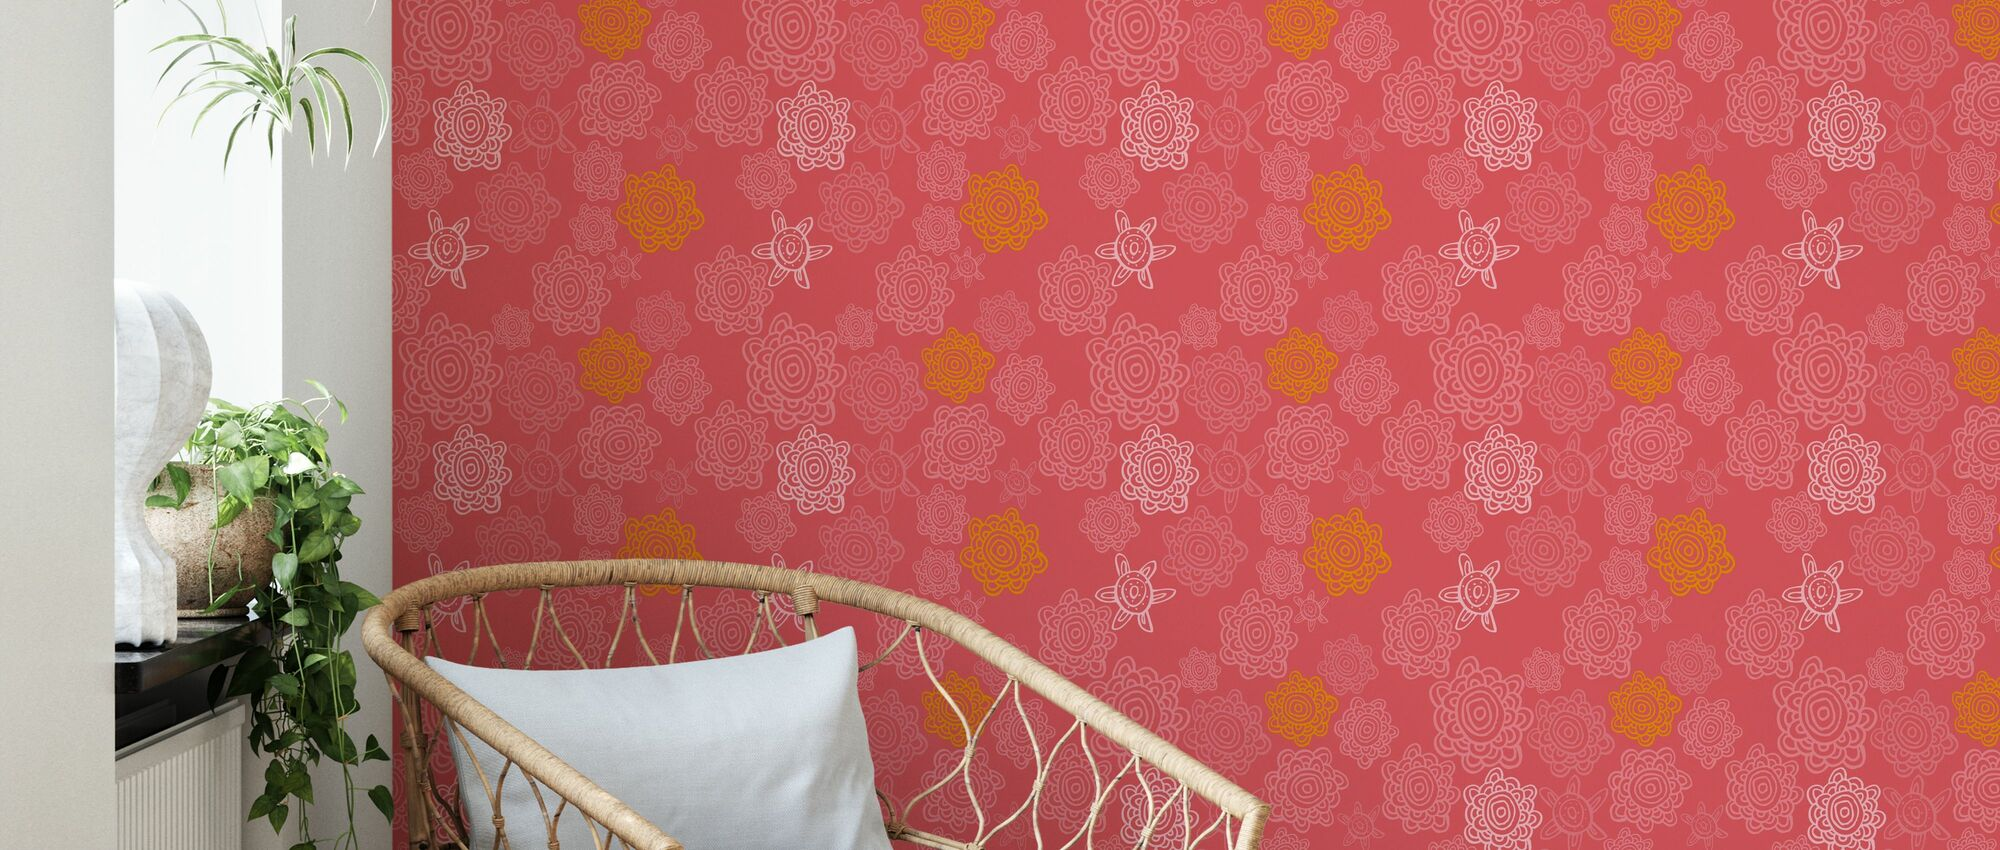 Swirlygirly - Cosy - Wallpaper - Living Room